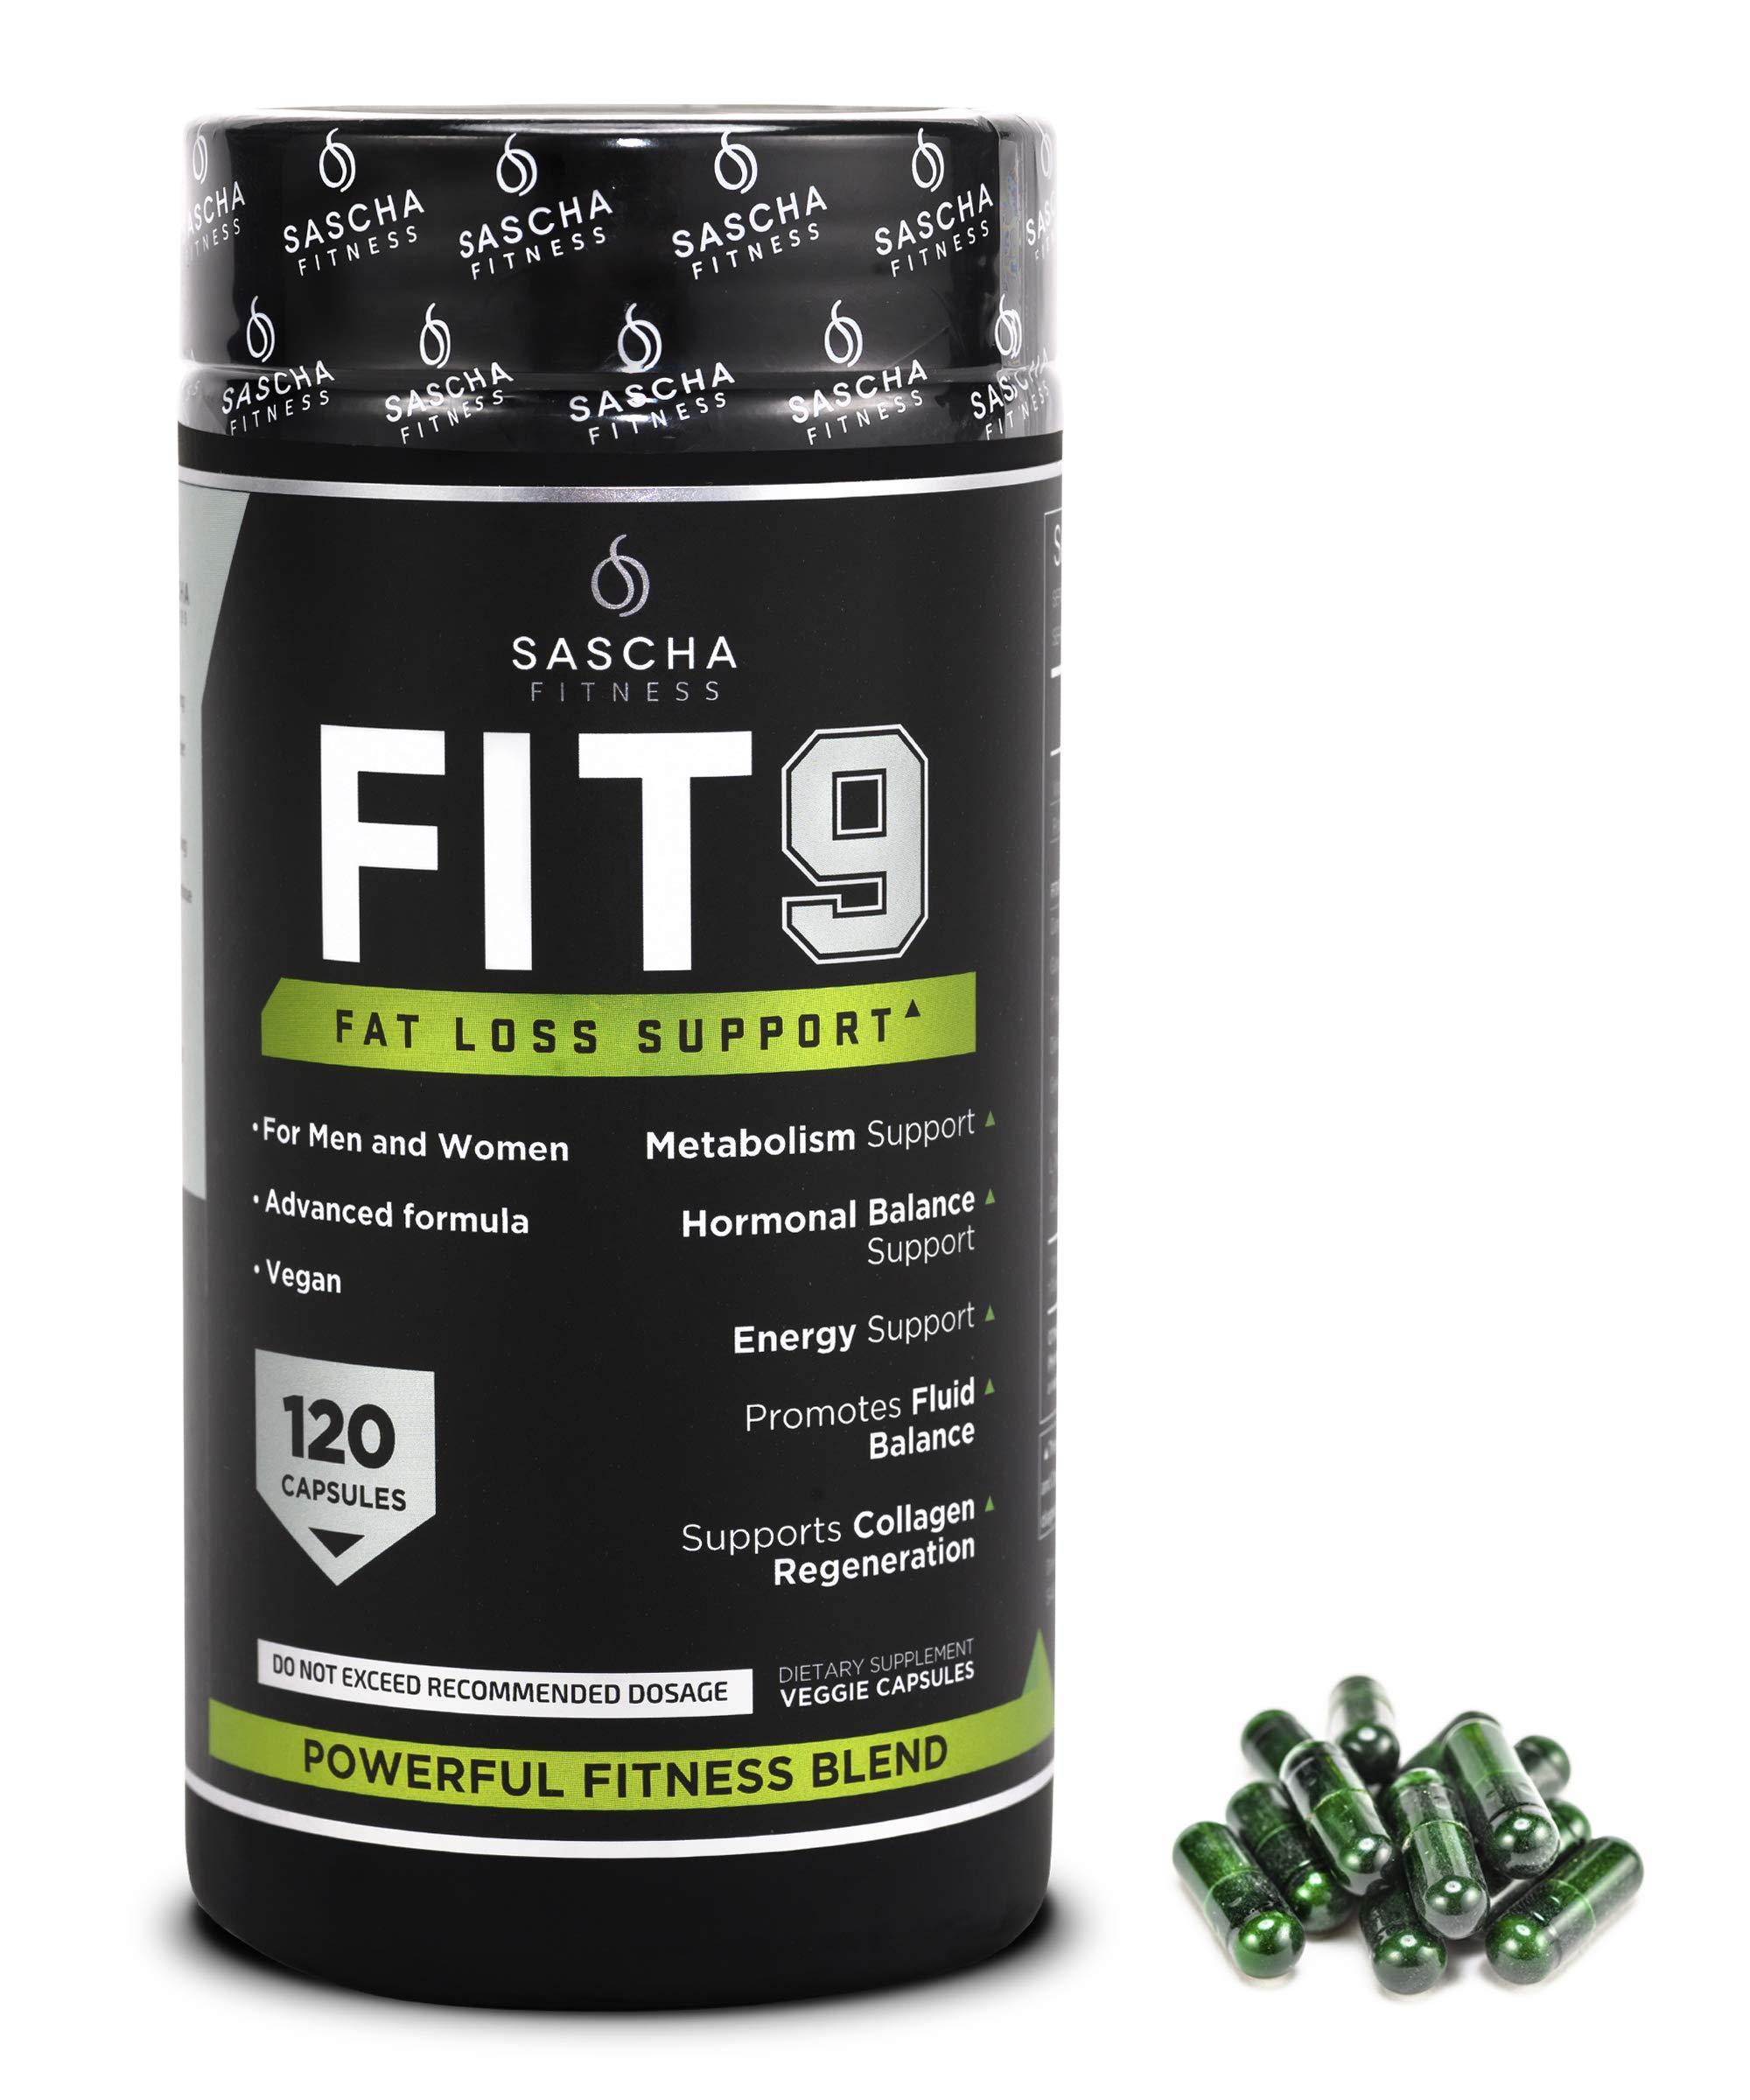 Sascha Fitness Fat Loss pills | Collagen support | Fluid Balance | FIT9 Ingredients: 7Keto + Uva Ursi, Gotu Kola, L-Theanine,Gingko Biloba,DIM,Green Tea | Weight Loss Supplements-Vegan-120 Natural Cap by SASCHA FITNESS (Image #2)